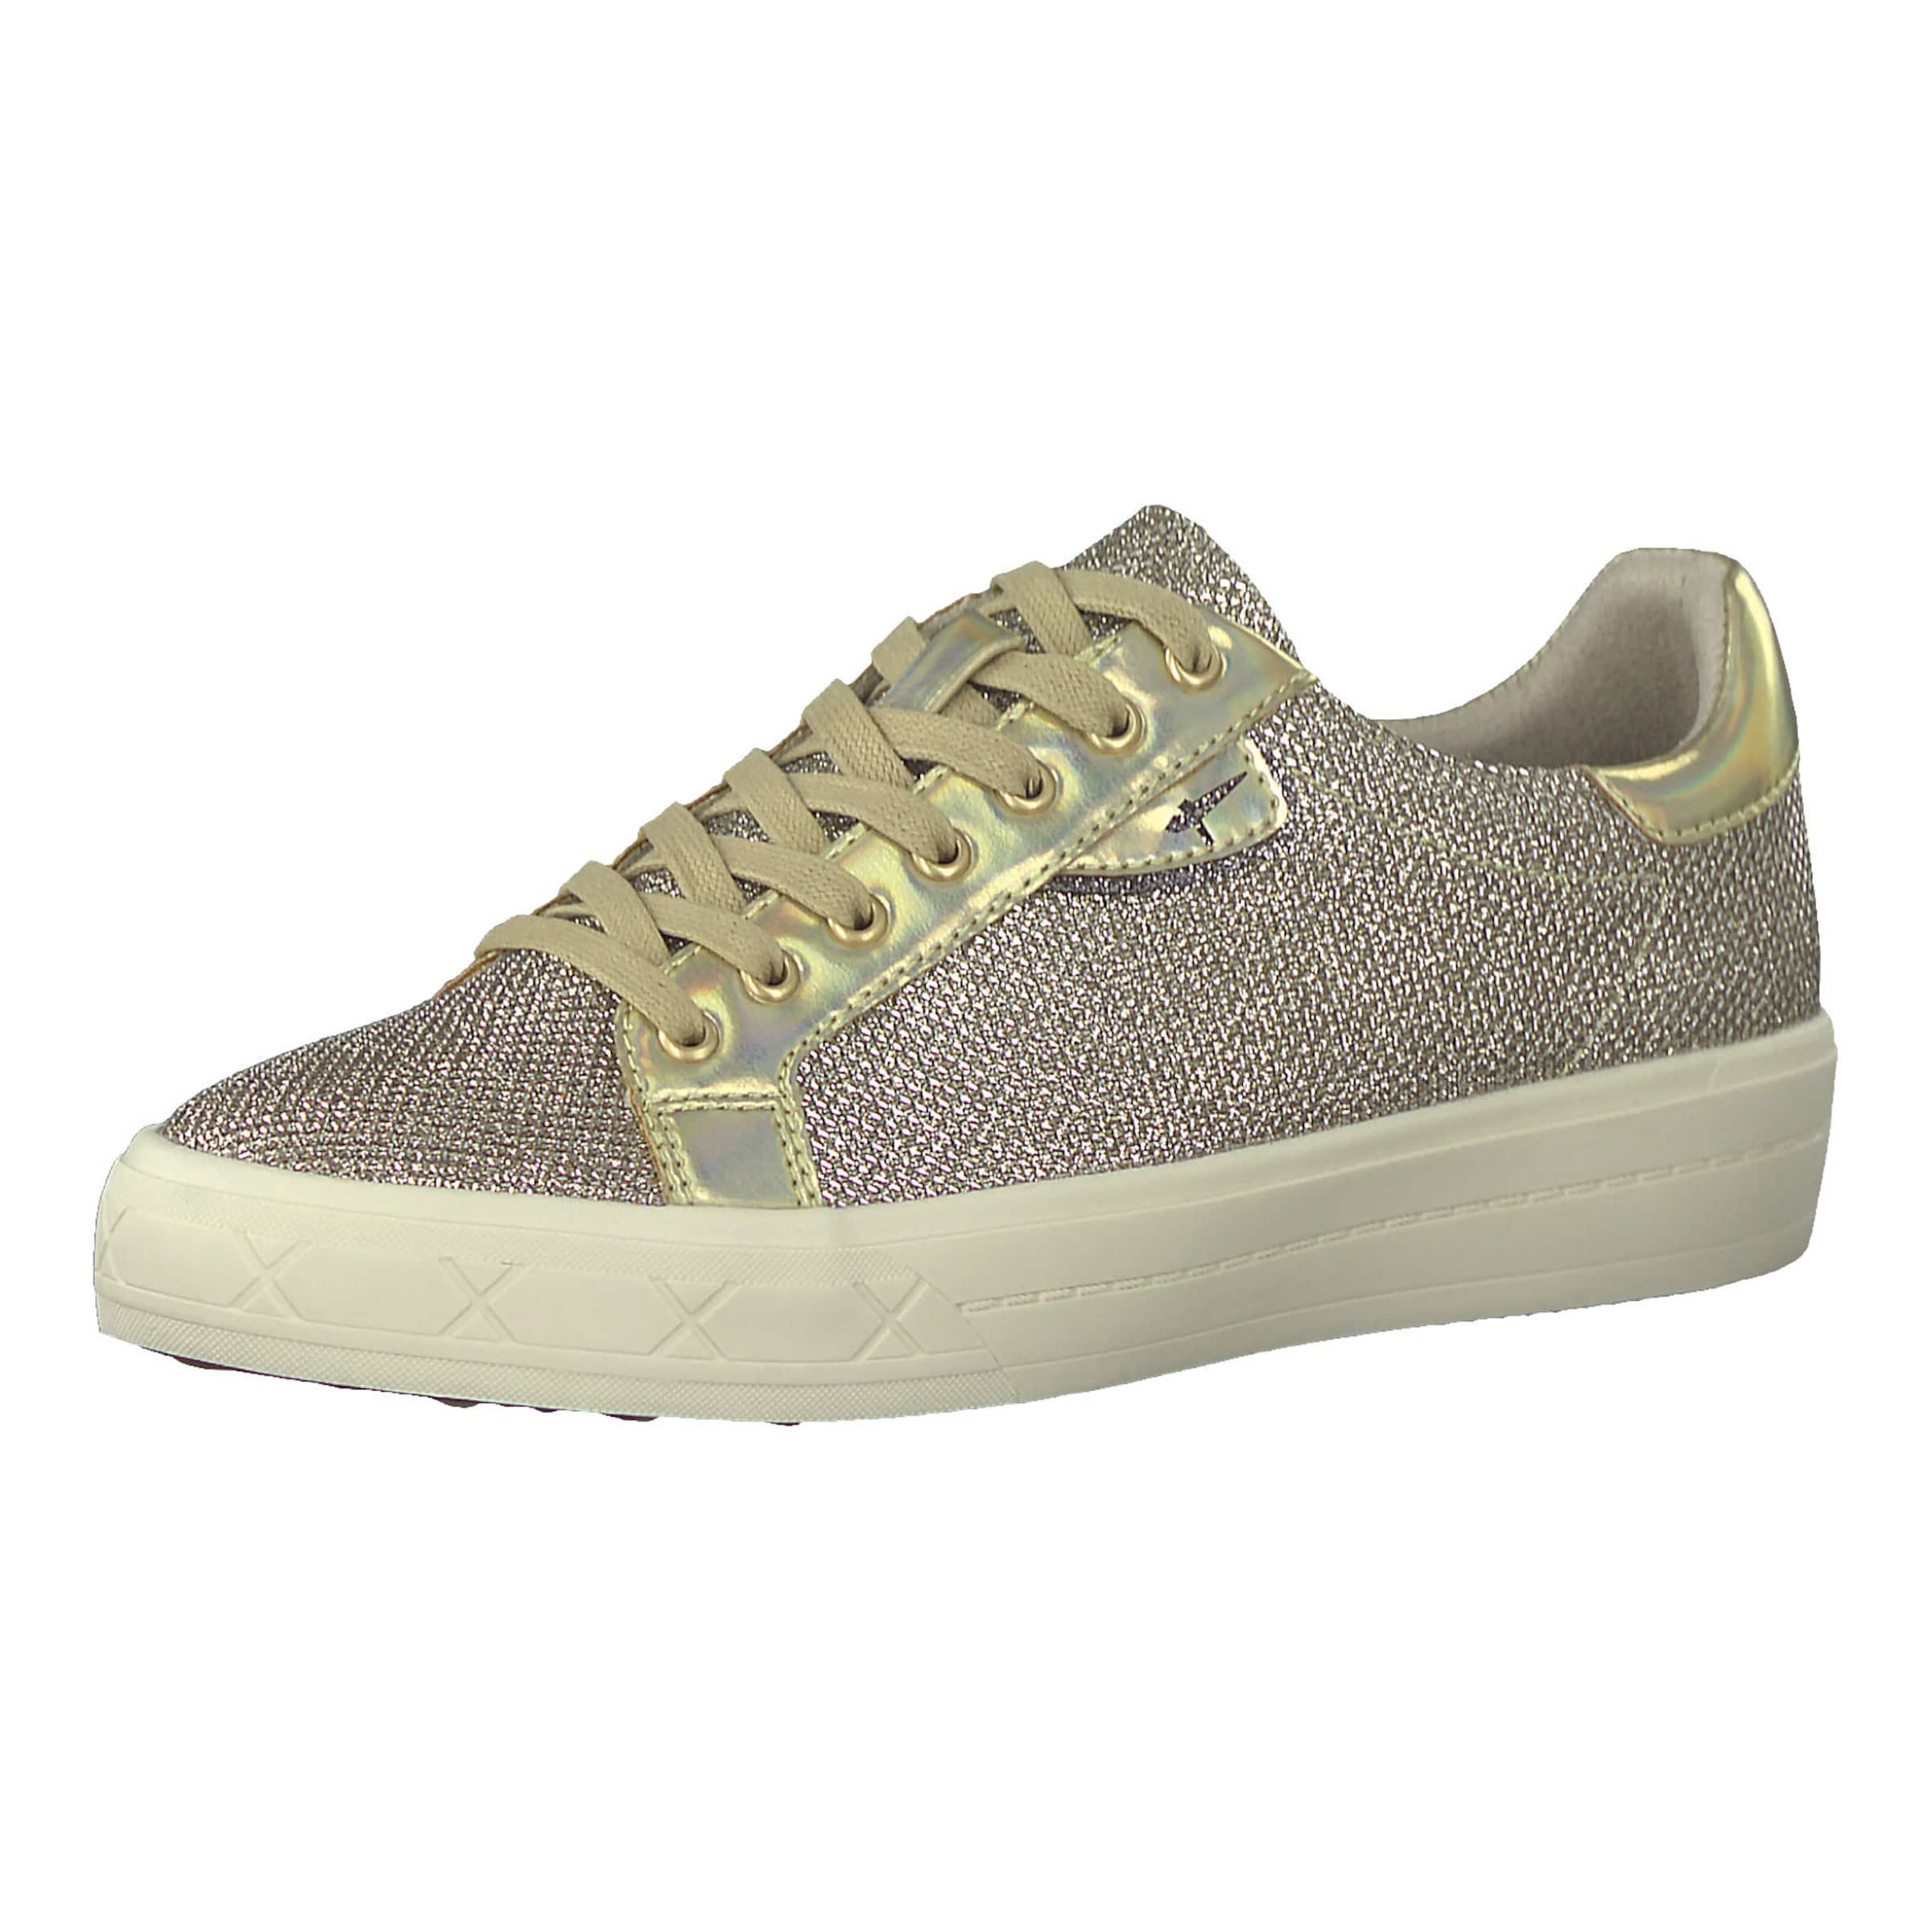 TAMARIS Sneakers Low Günstiger Preis Auslass CqoY4cHT